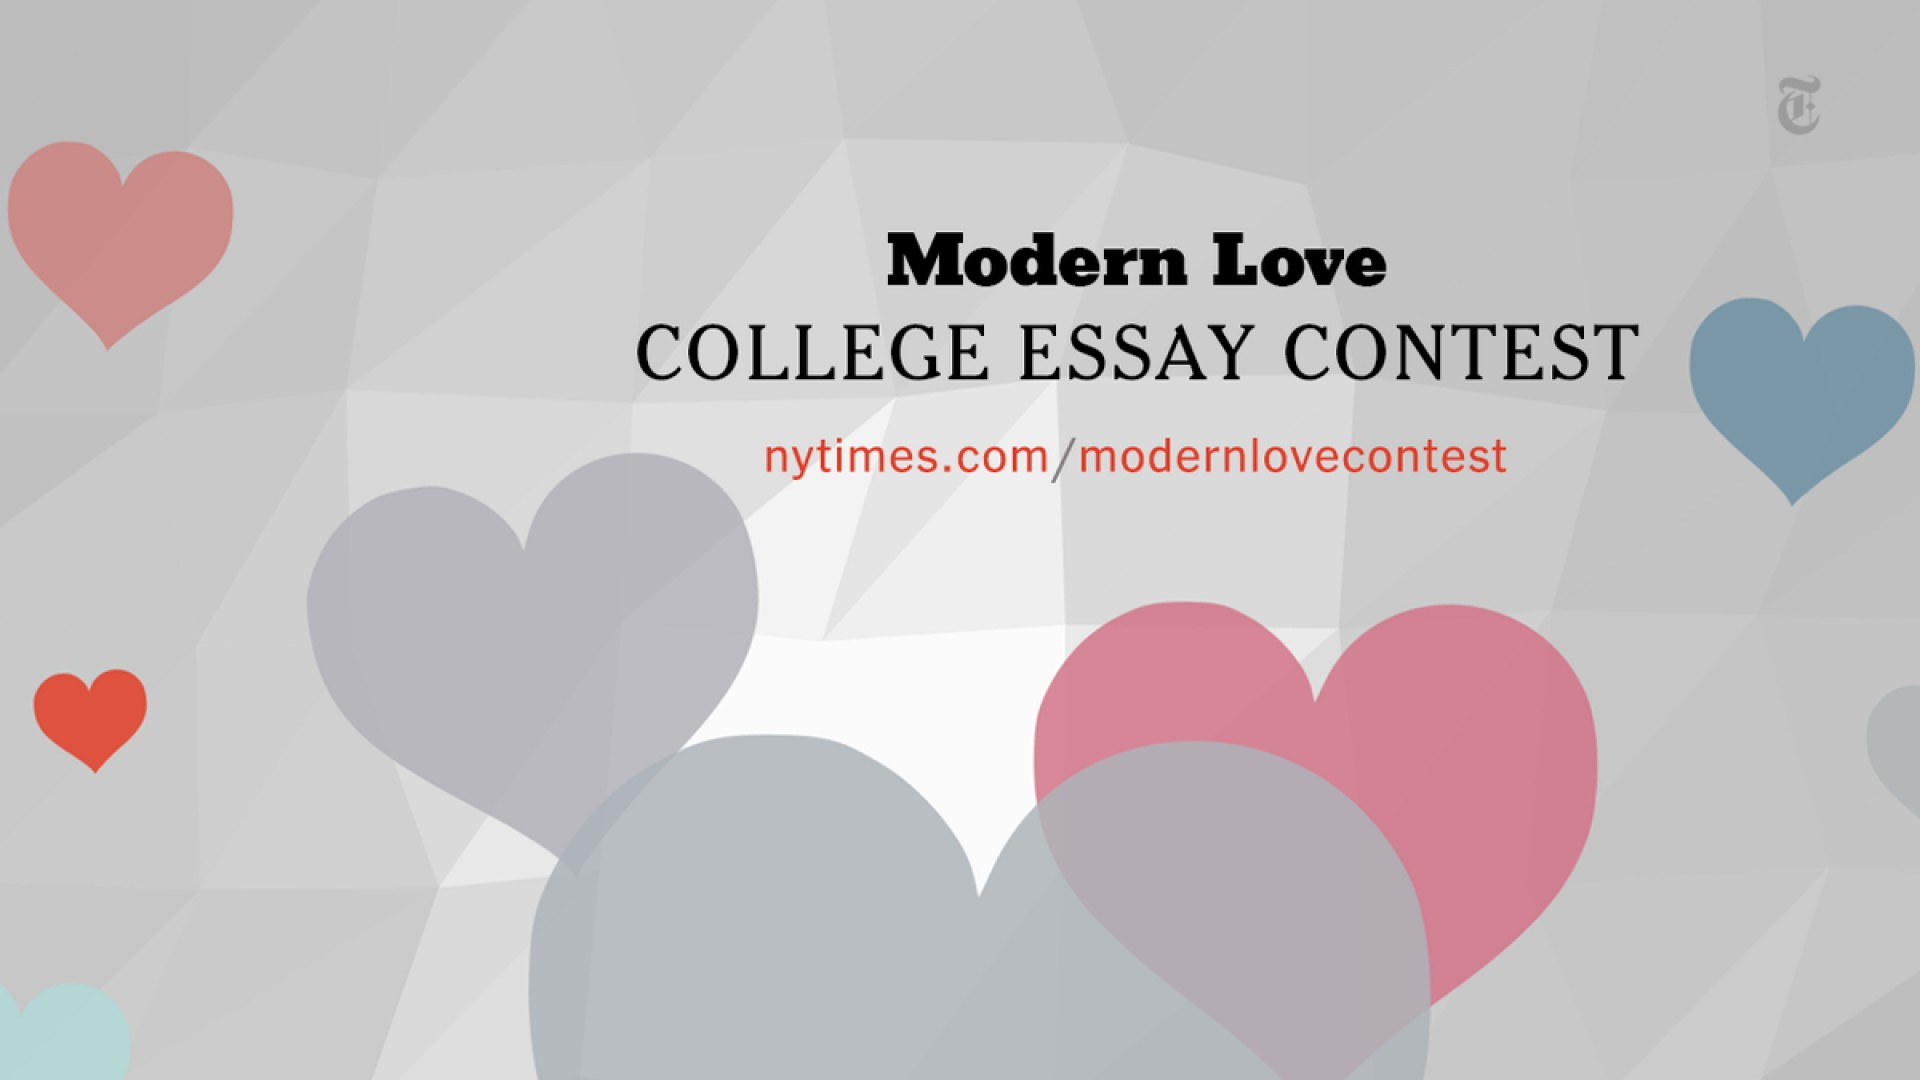 007 Modern Love College Essay Contest Example B9iz Impressive 2016 1920